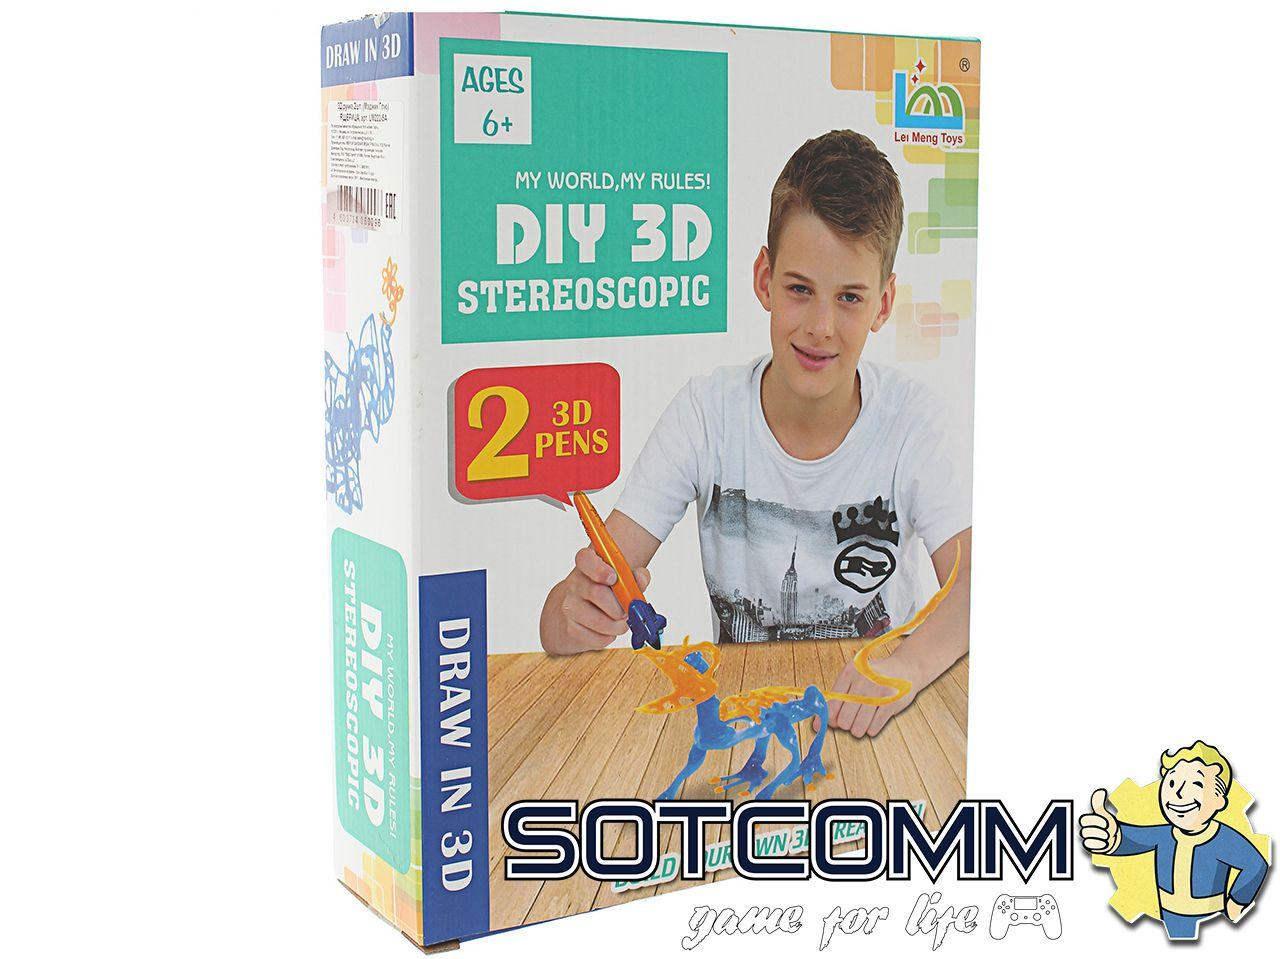 3D ручка Diy 3D Stereoscopic набор 2 ручки